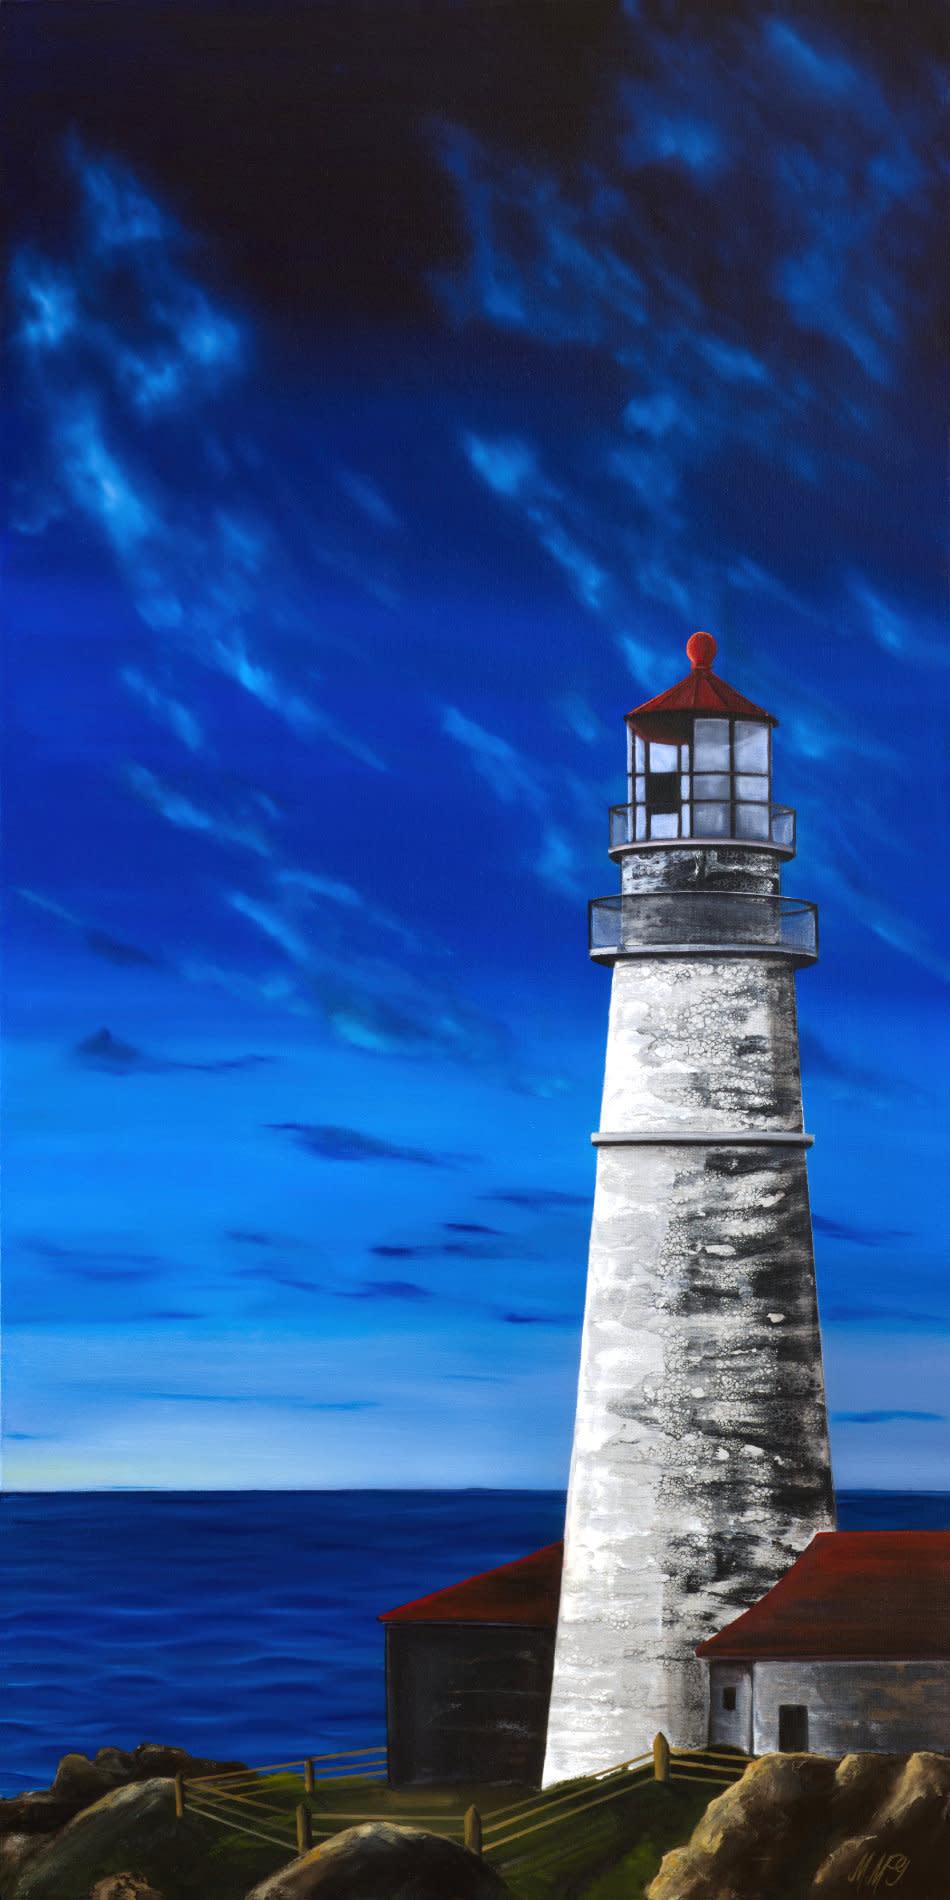 Evening lighthouse web xxux3v